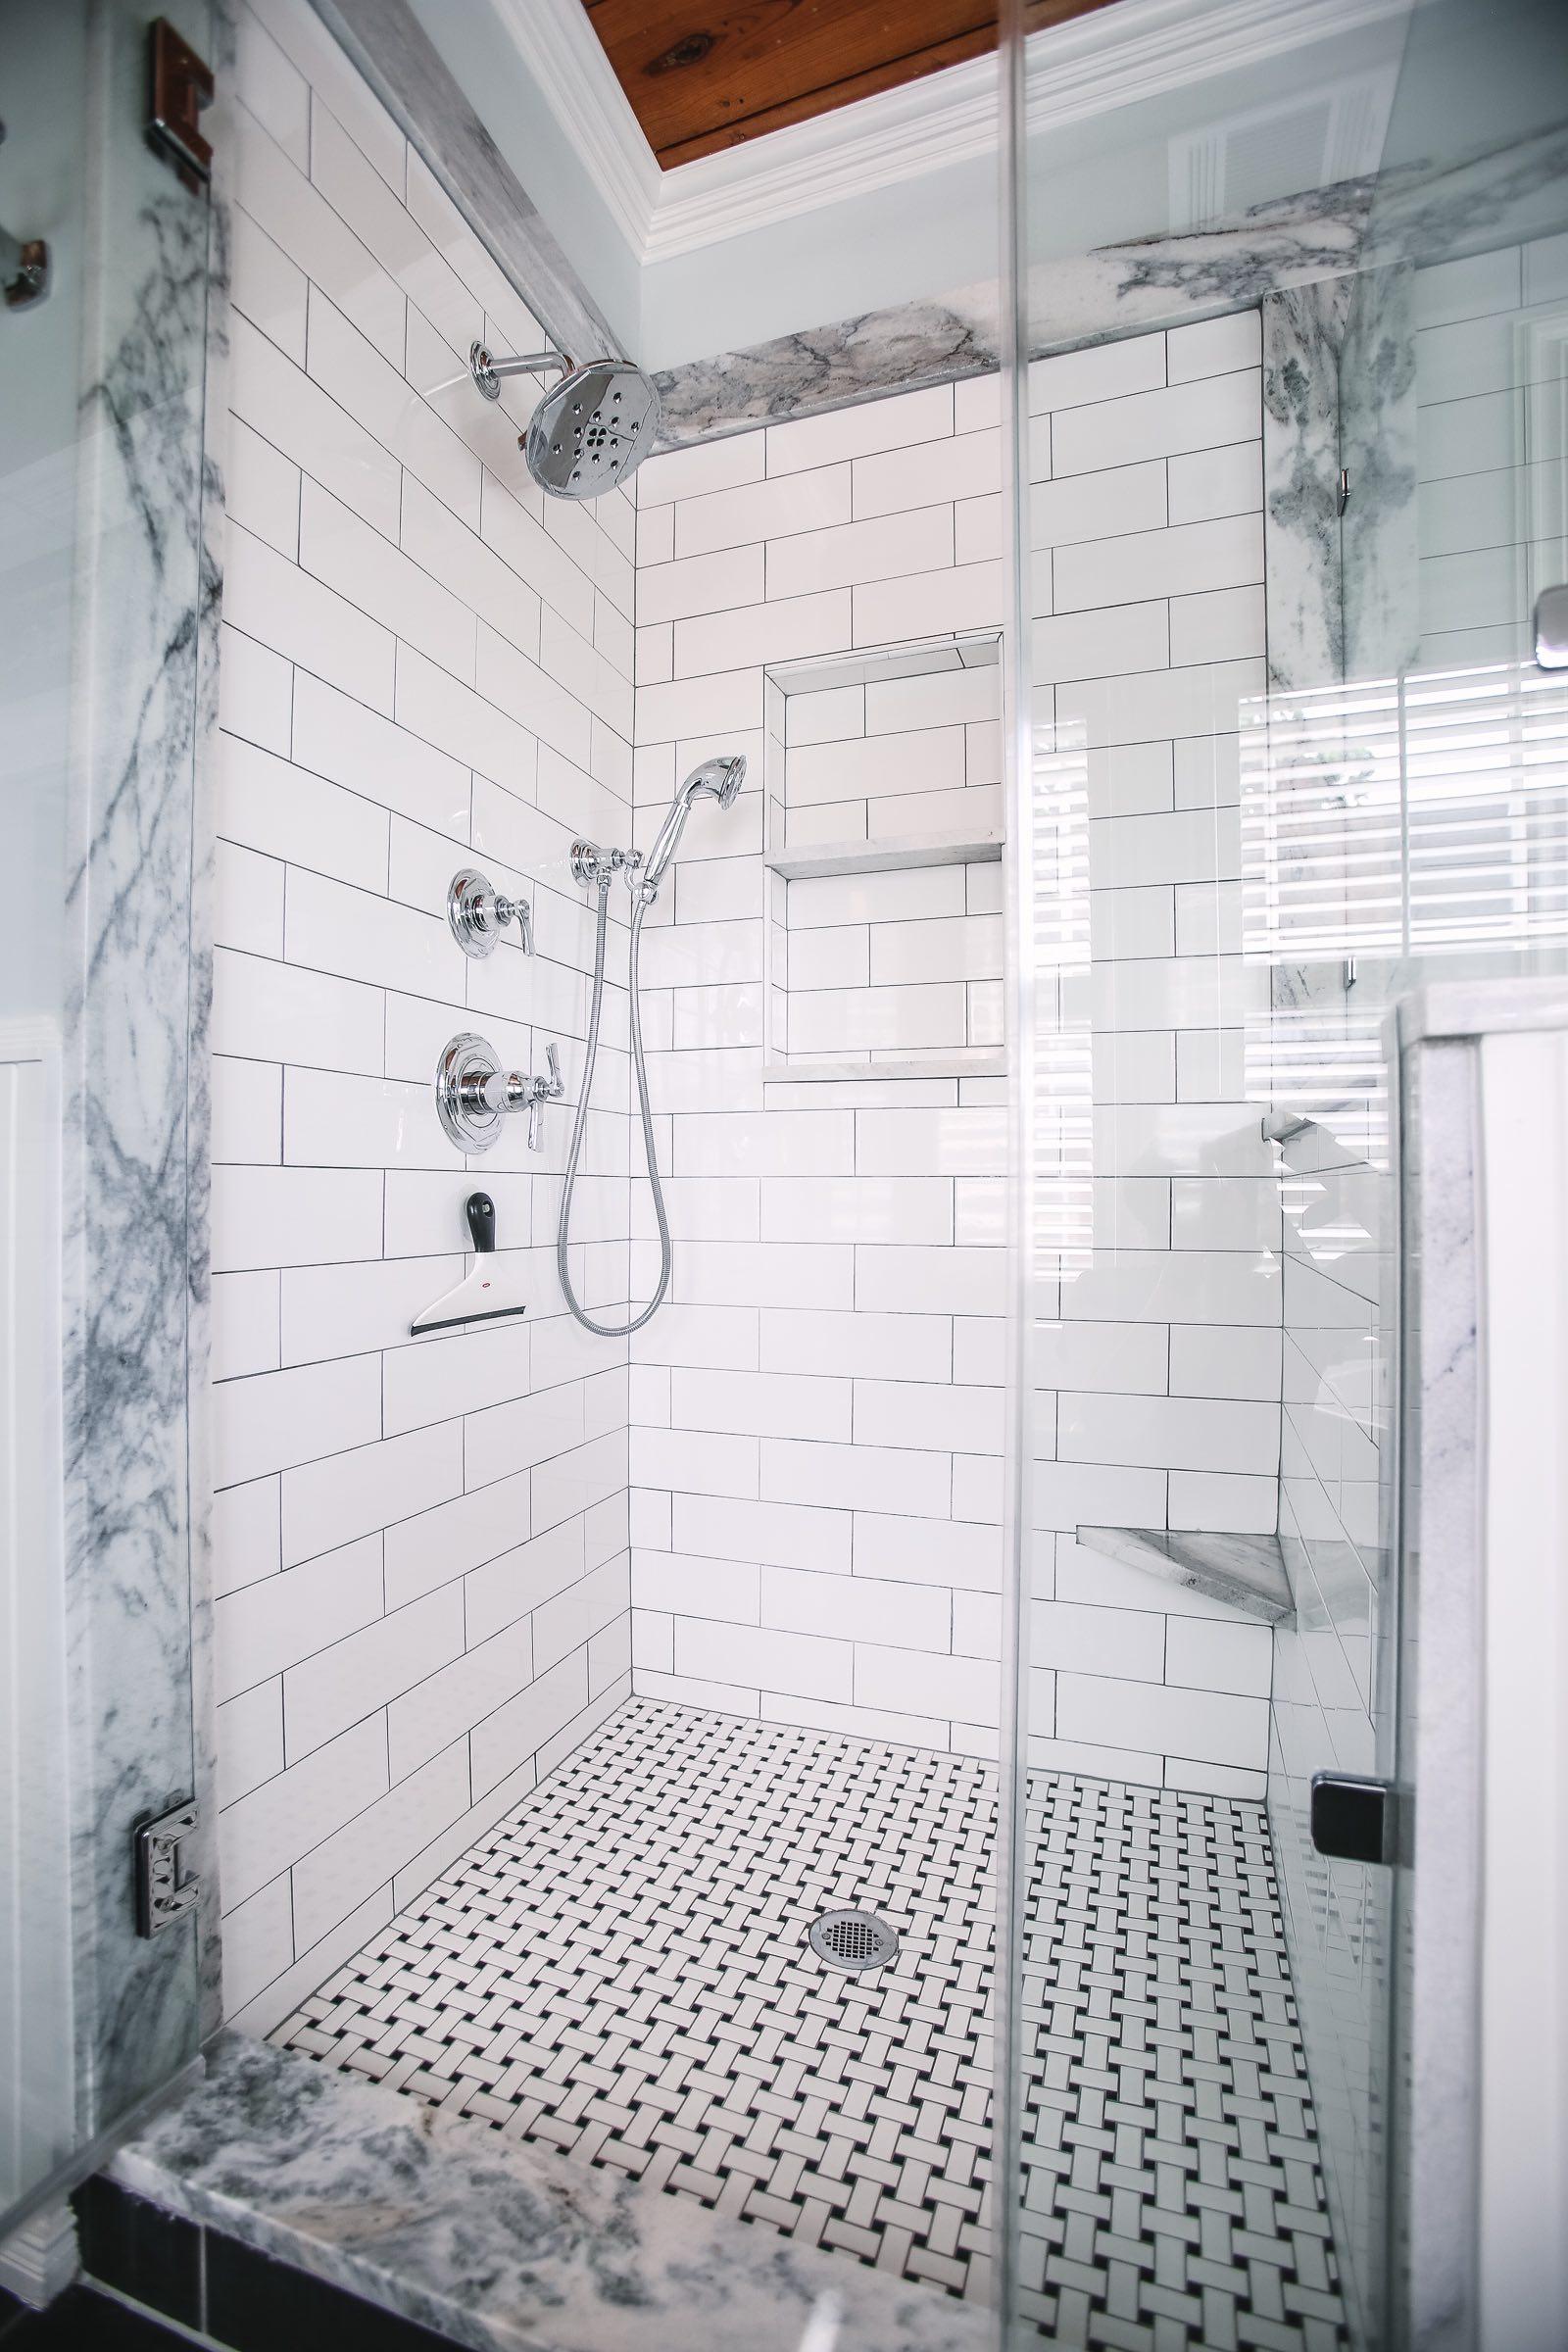 Bathroom-renovation-with-subway-tile.jpg